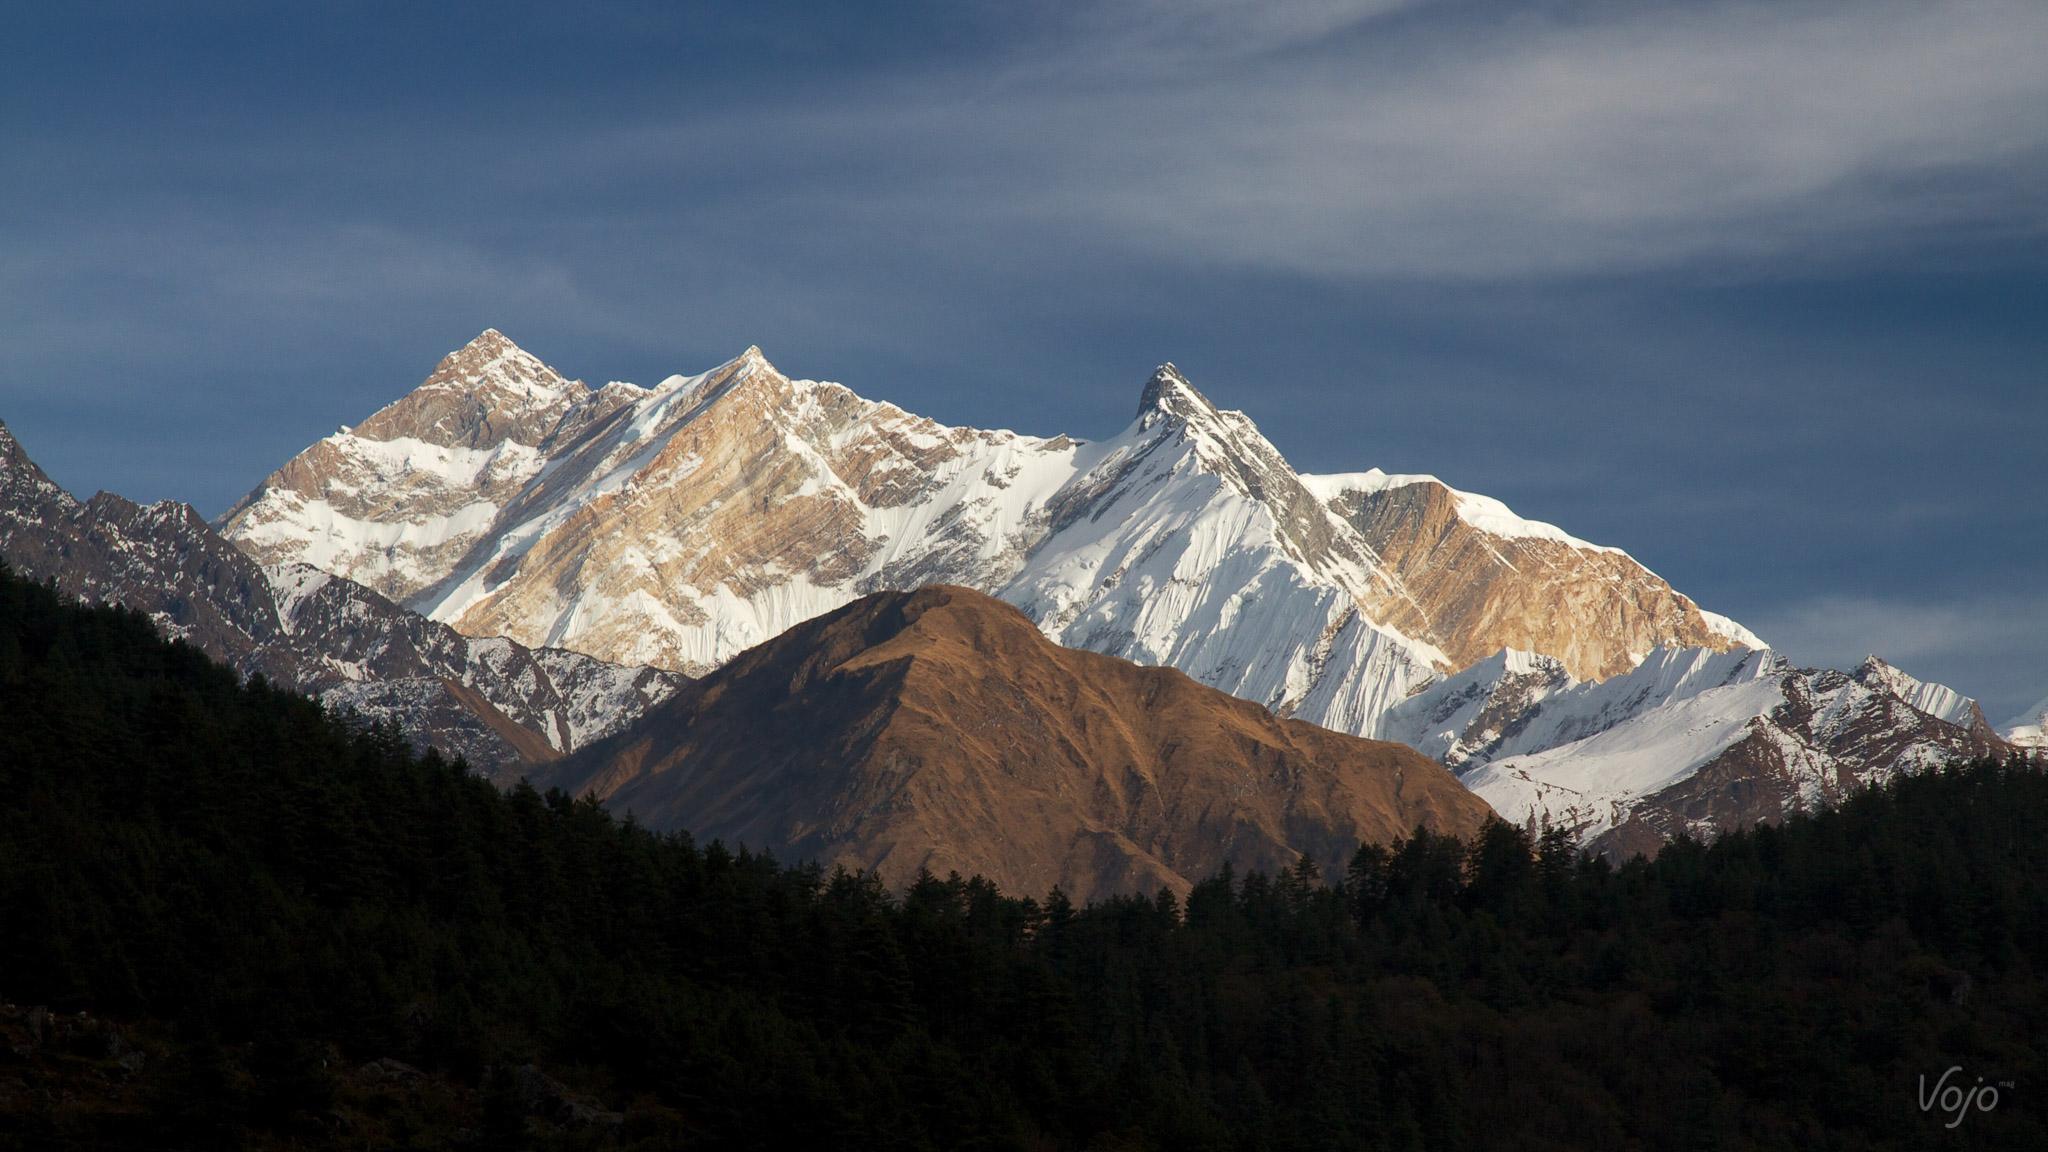 Nepal_Copyright_Molinero_VojoMag-13